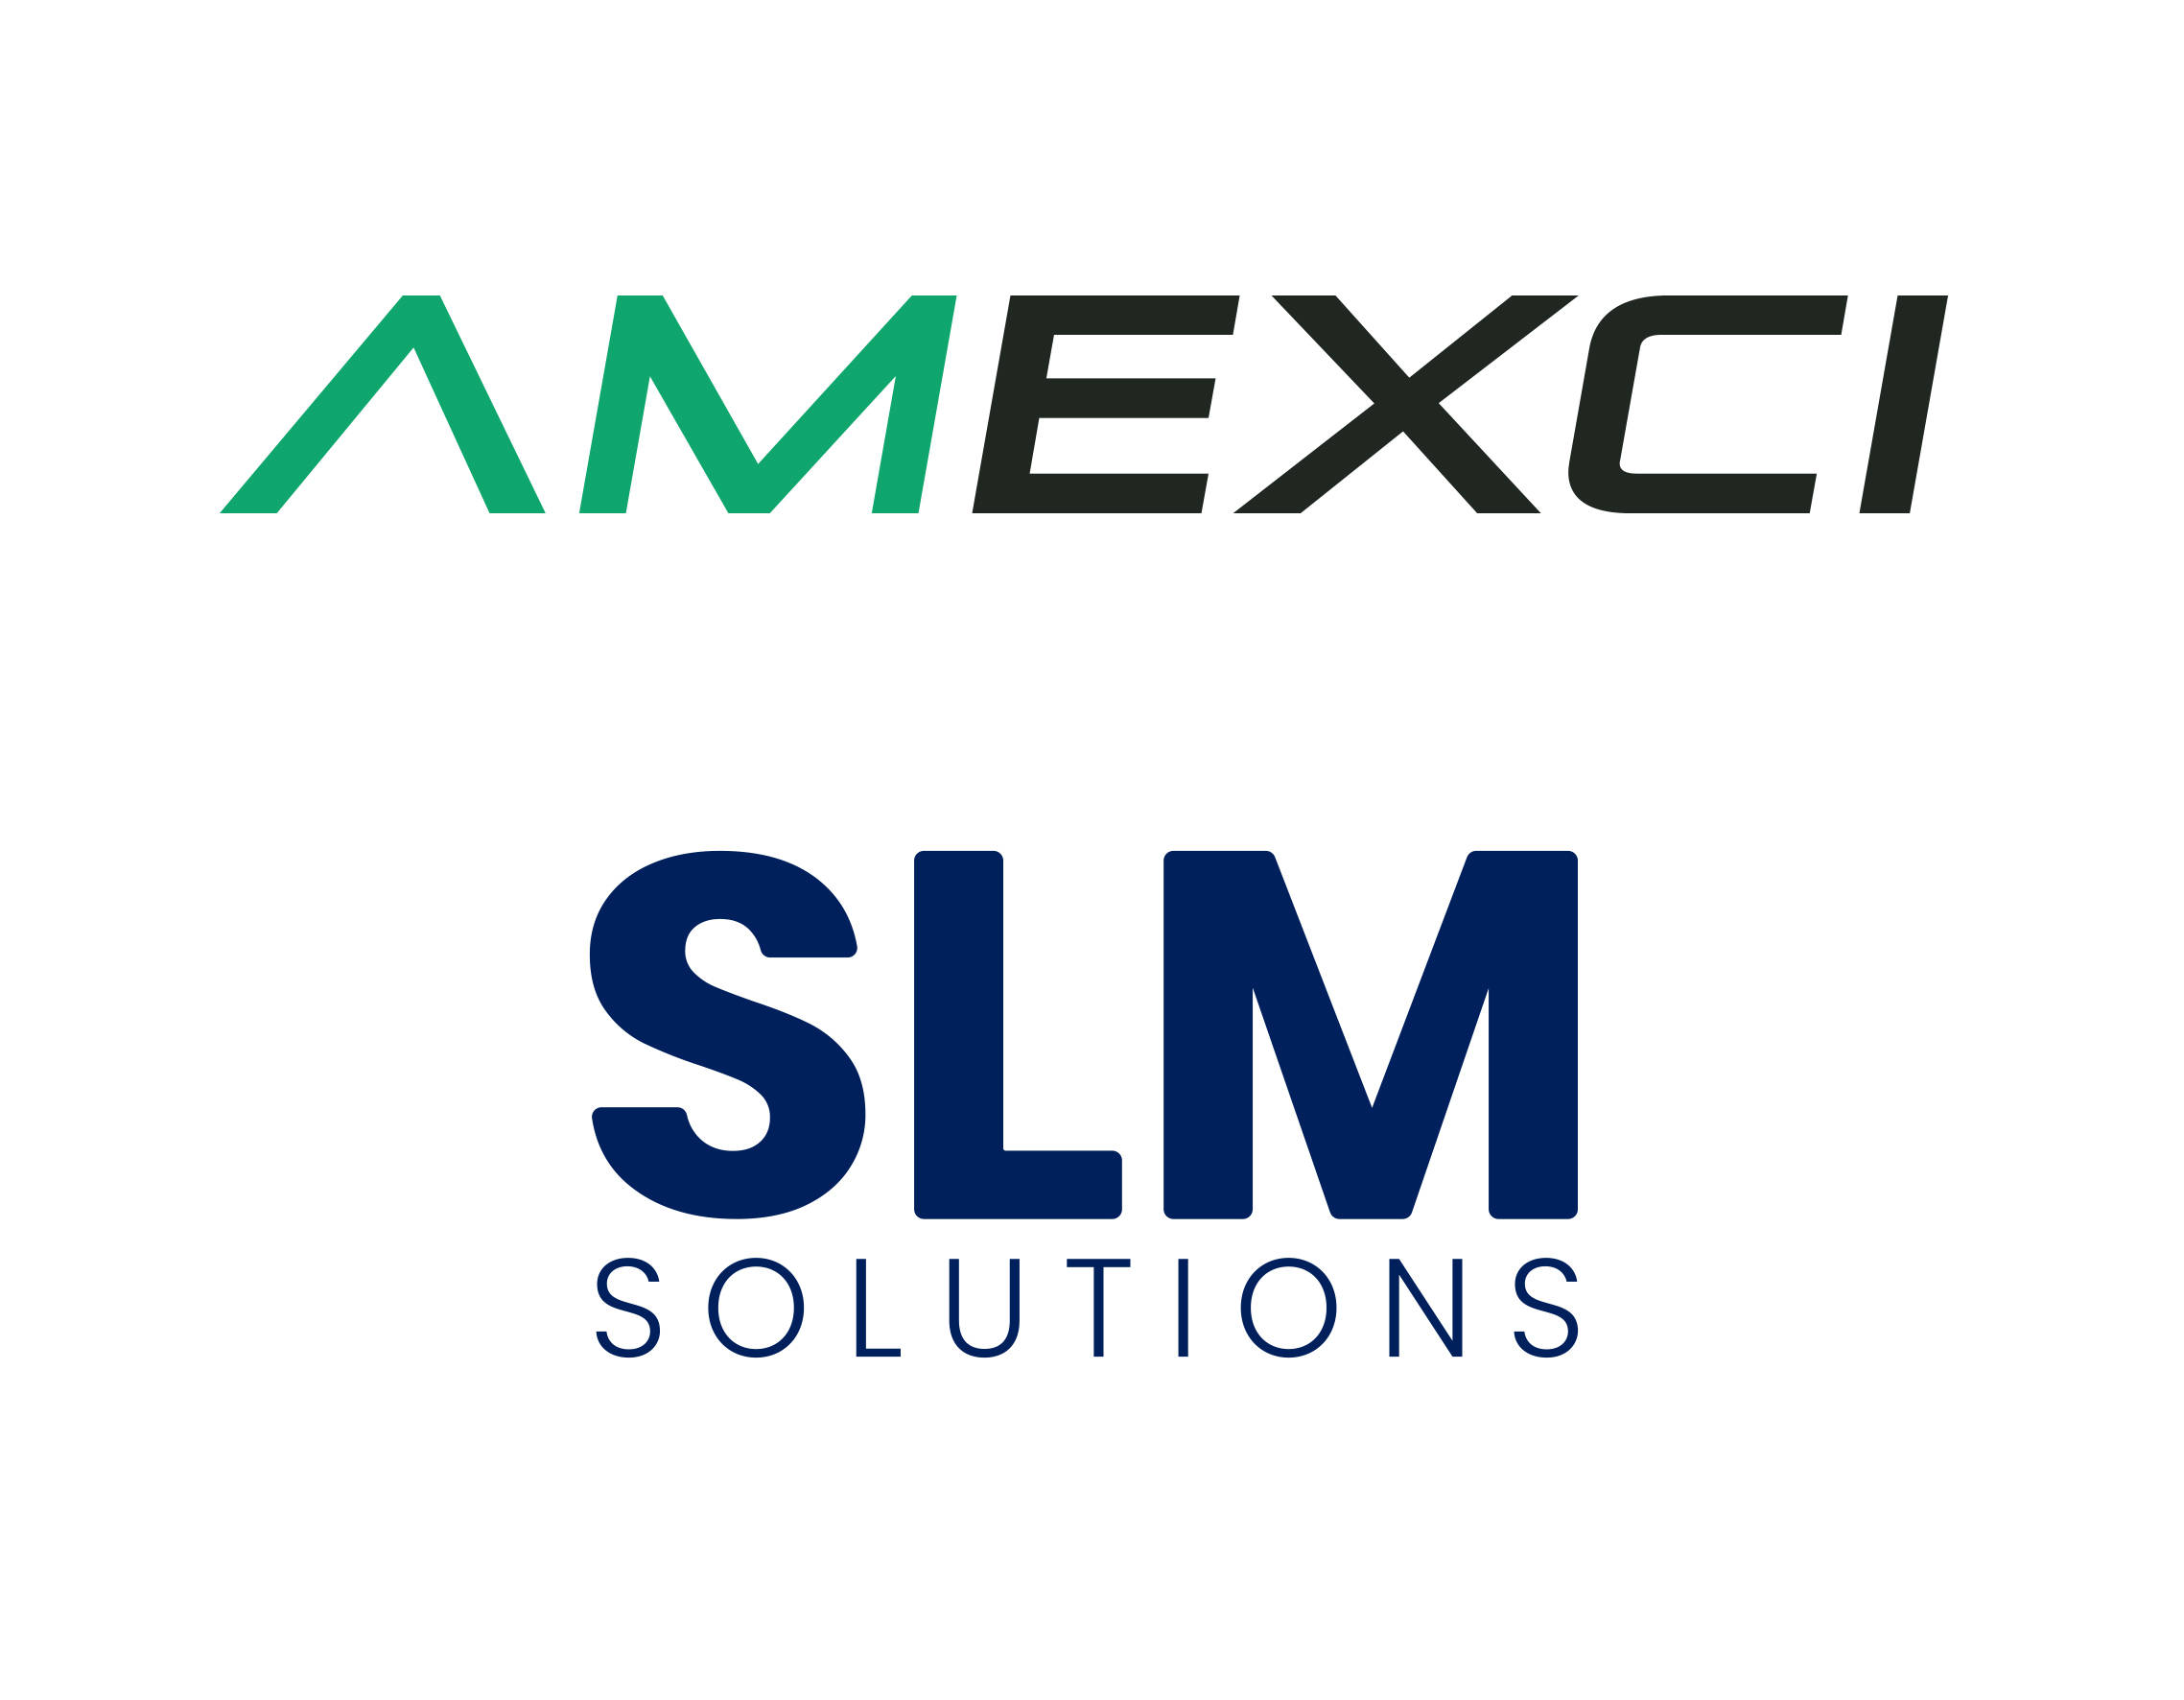 AMEXCI采购SLM Solutions 四激光金属机,加速金属增材制造工业化进程